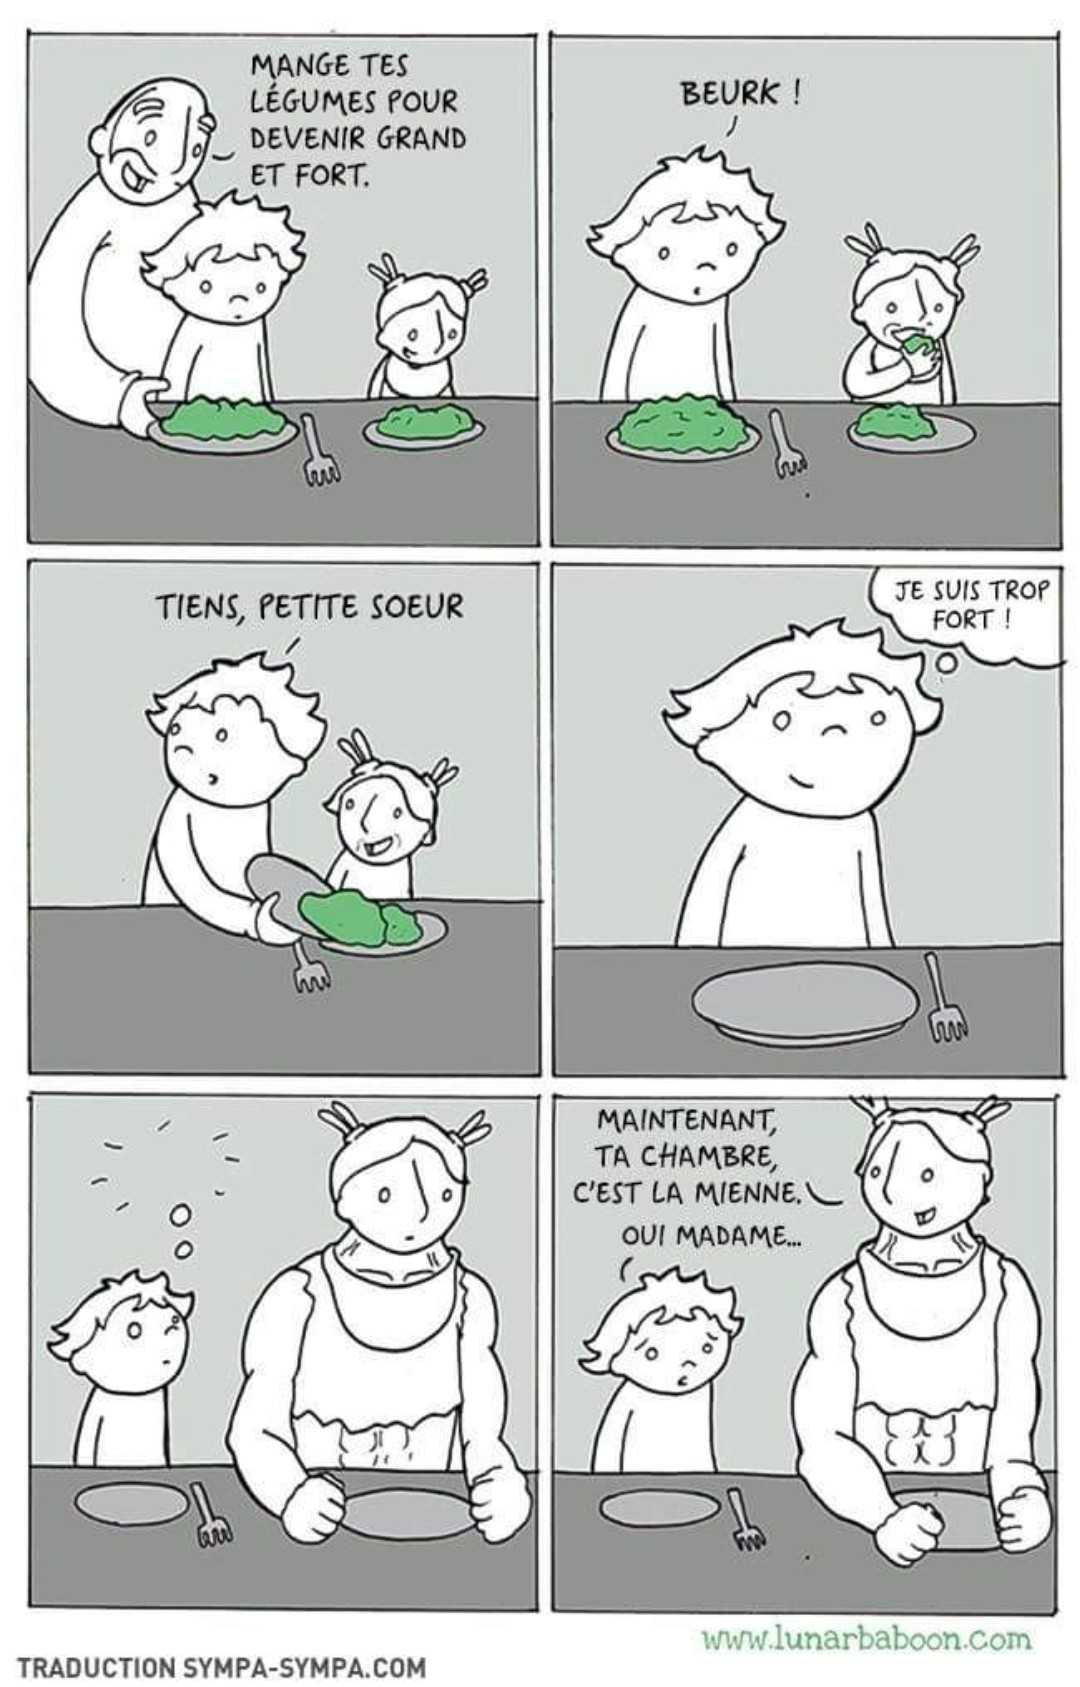 Toujours, toujours manger ses légumes ^^